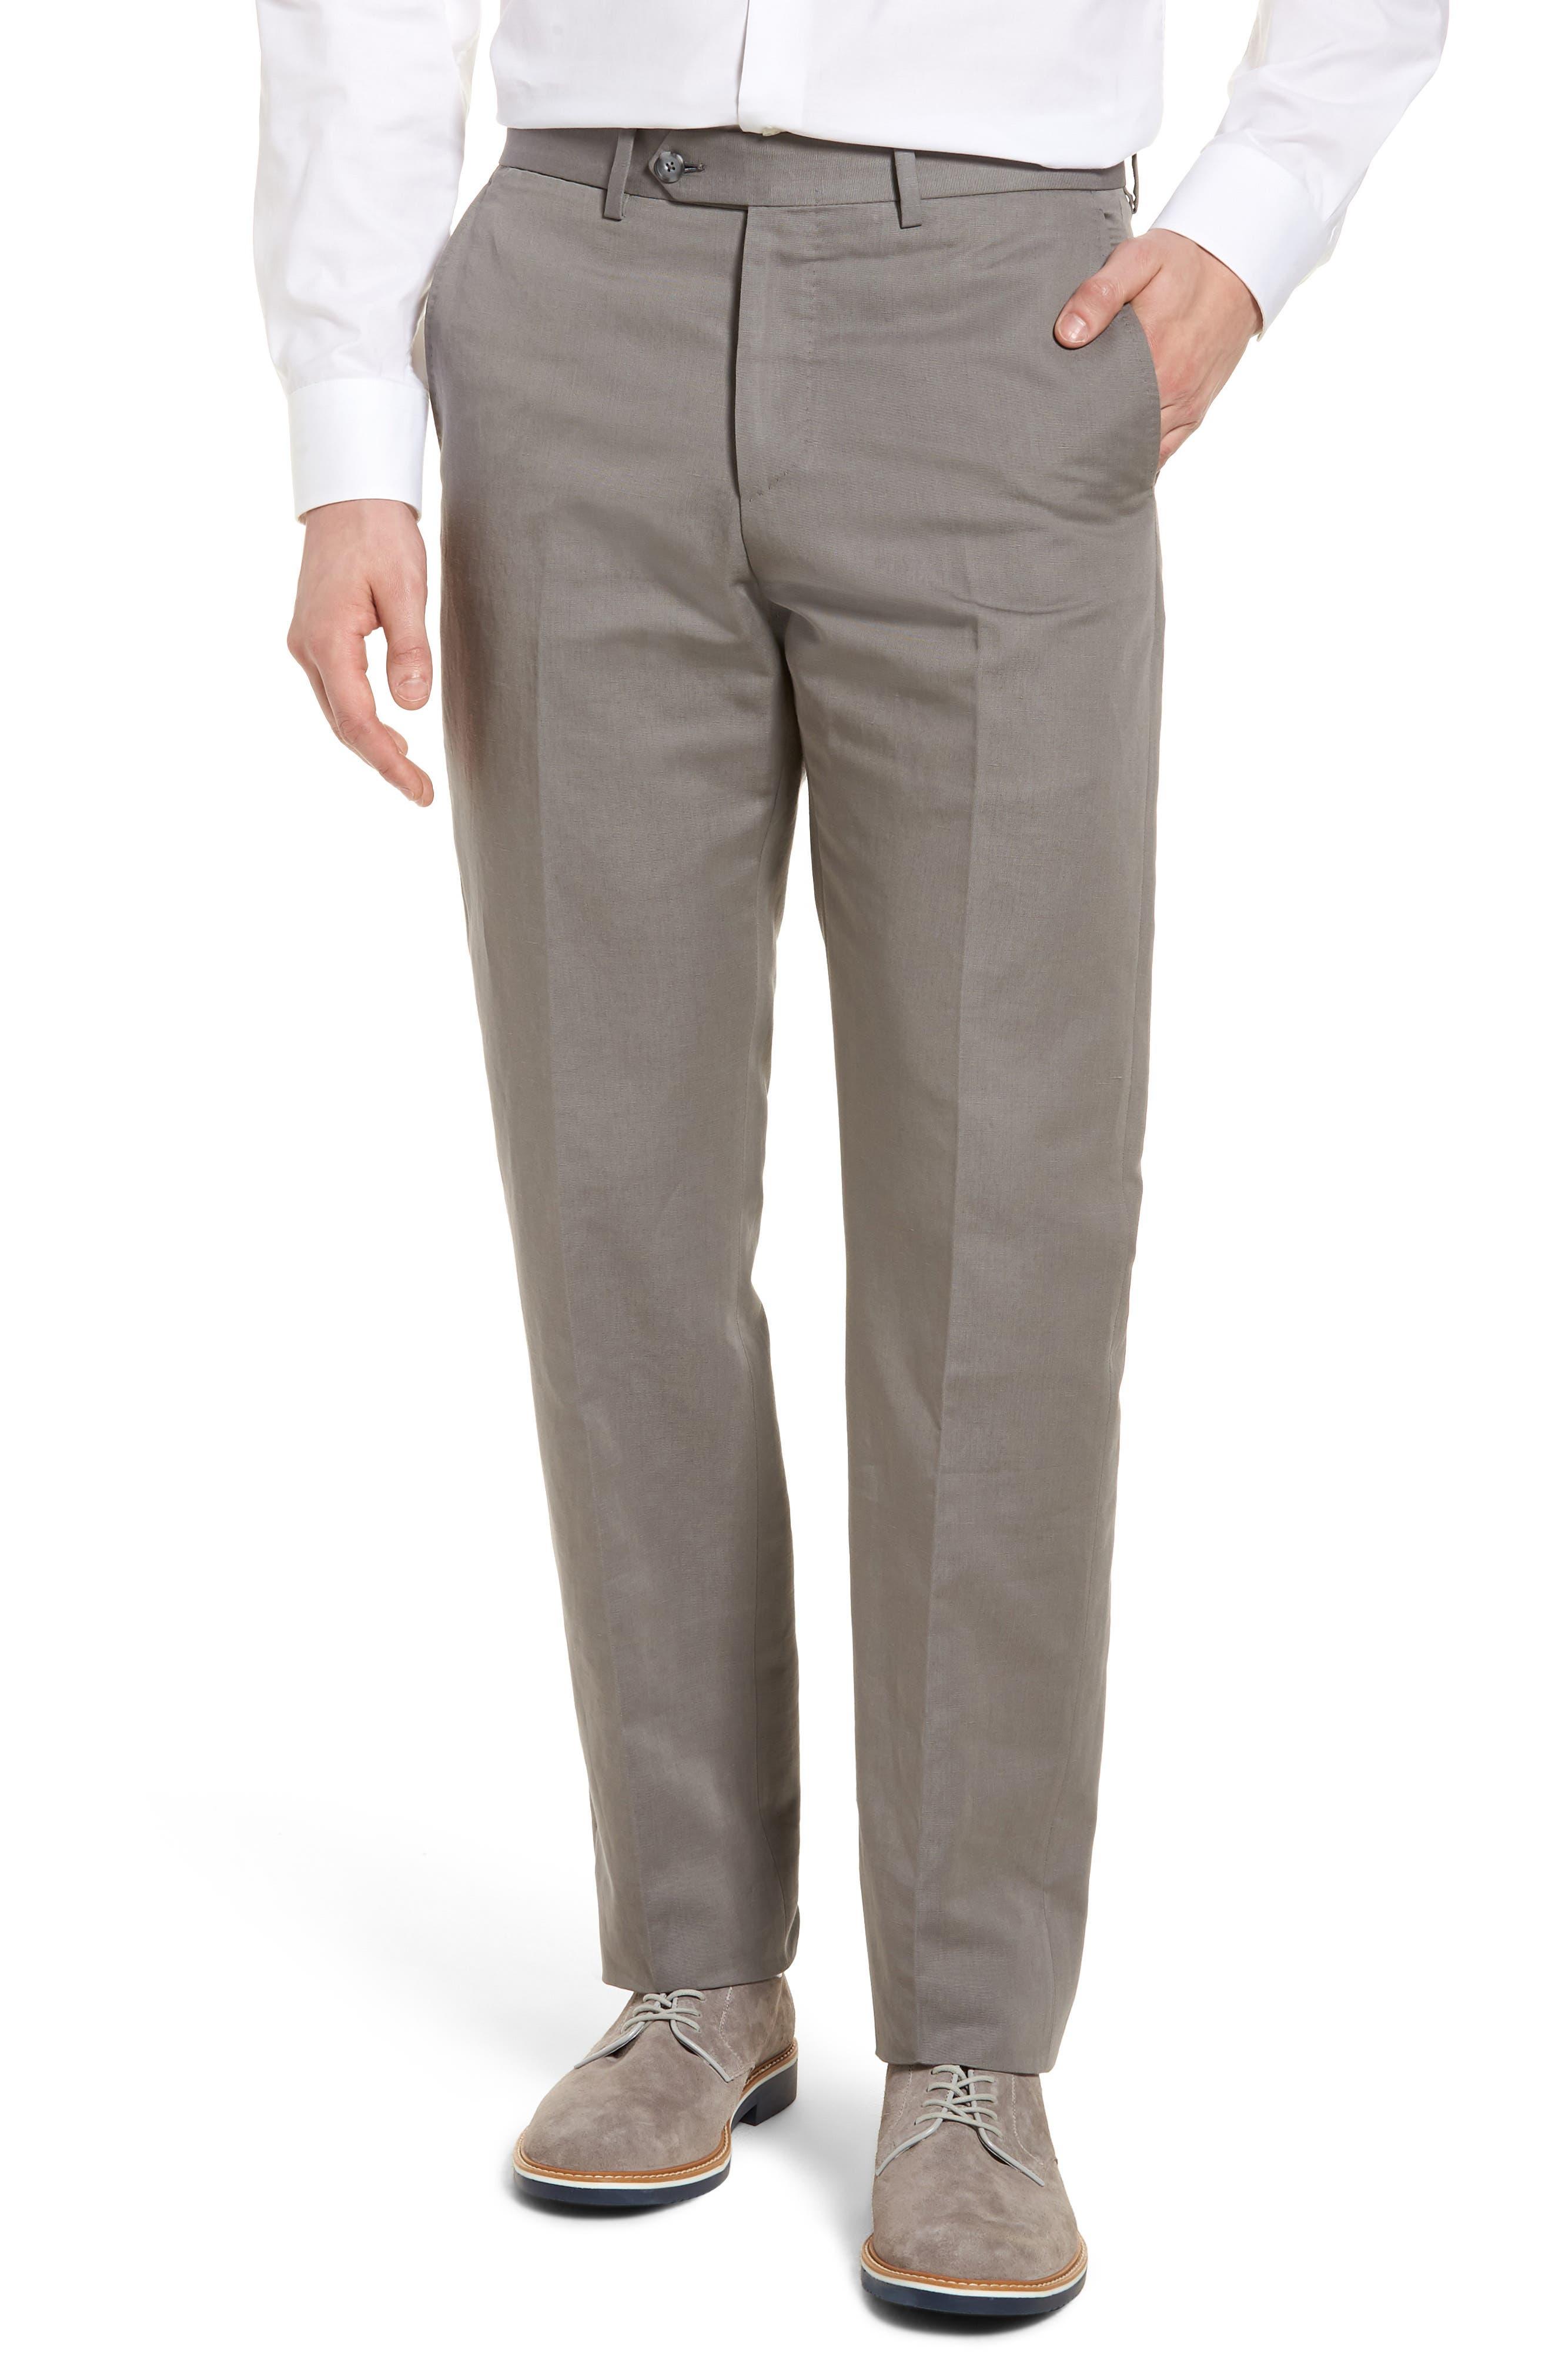 Flat Front Solid Cotton & Linen Trousers,                             Main thumbnail 1, color,                             030